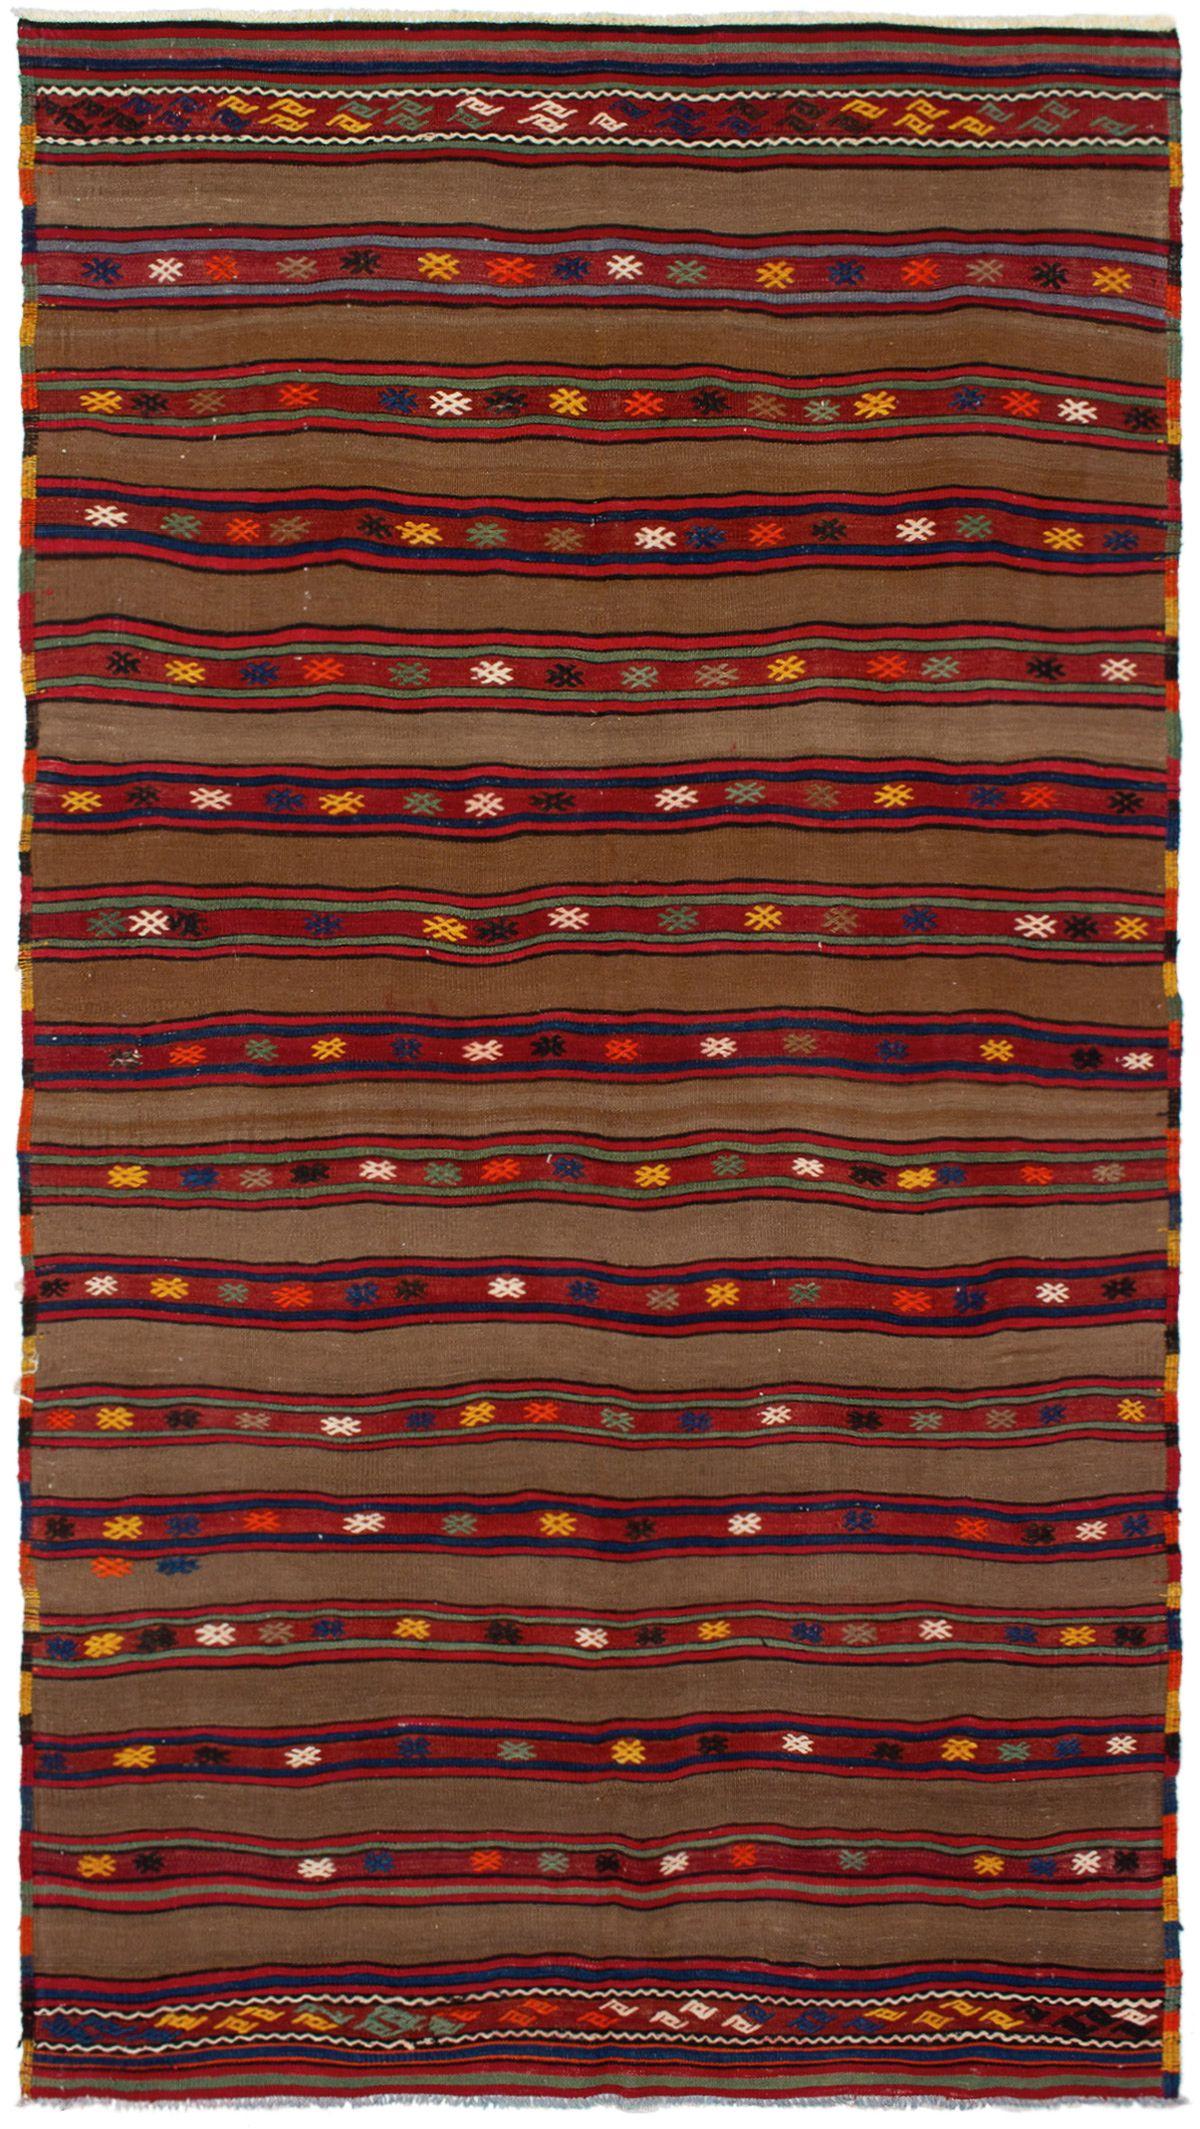 "Hand woven Bohemian Brown, Cream, Dark Navy, Light Orange, Red Wool Kilim 5'3"" x 9'8"" Size: 5'3"" x 9'8&qu"